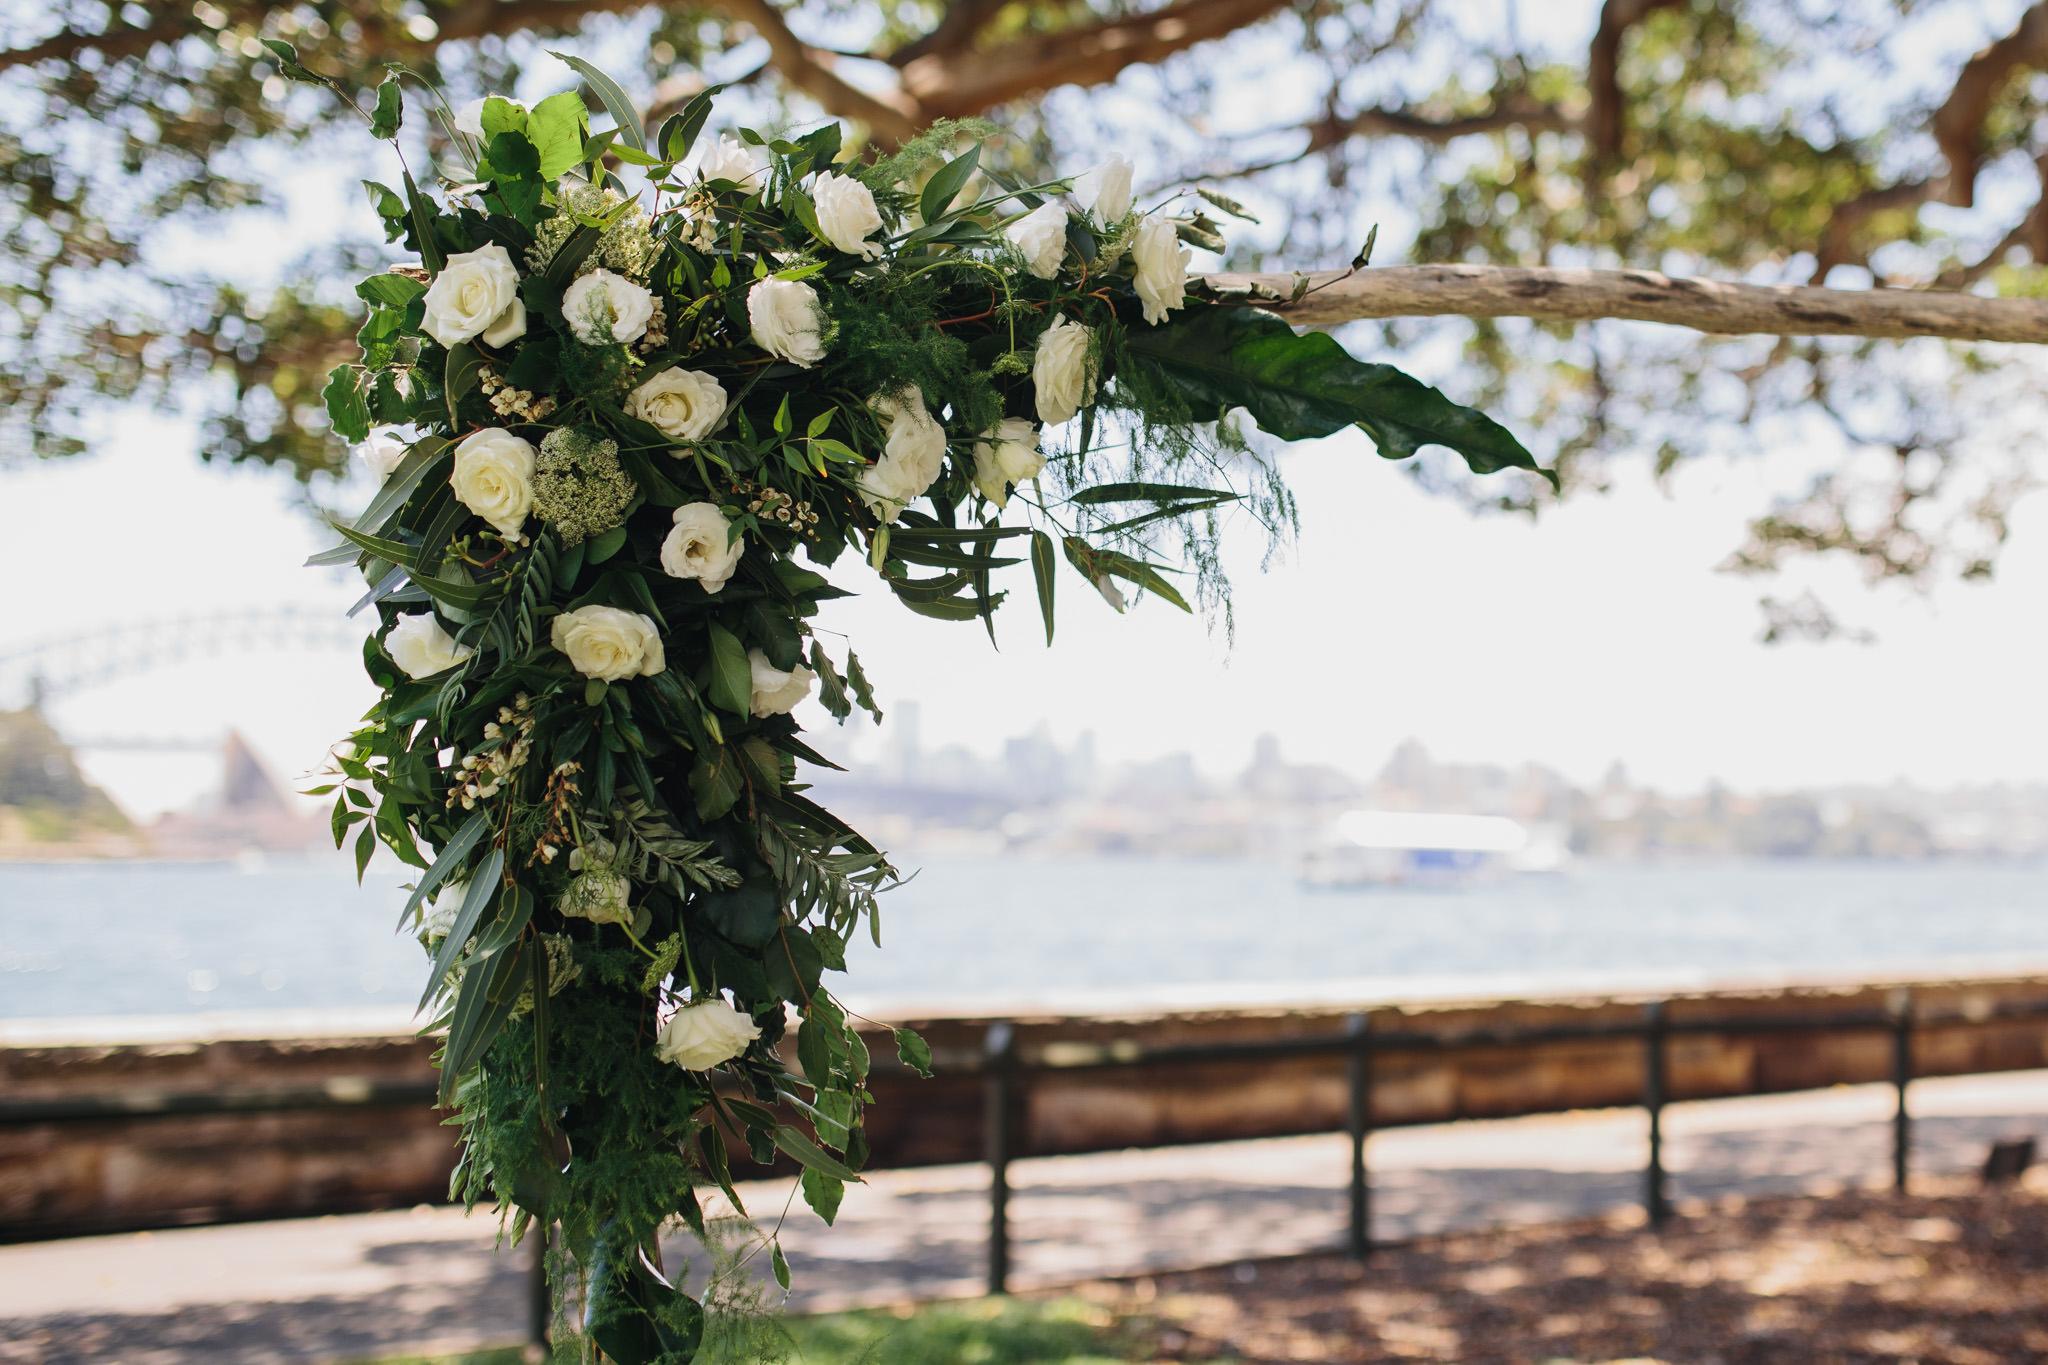 Wedding arch flowers at Sydney Botanic Garden wedding. Wedding on the Harbour View Lawn in Sydney